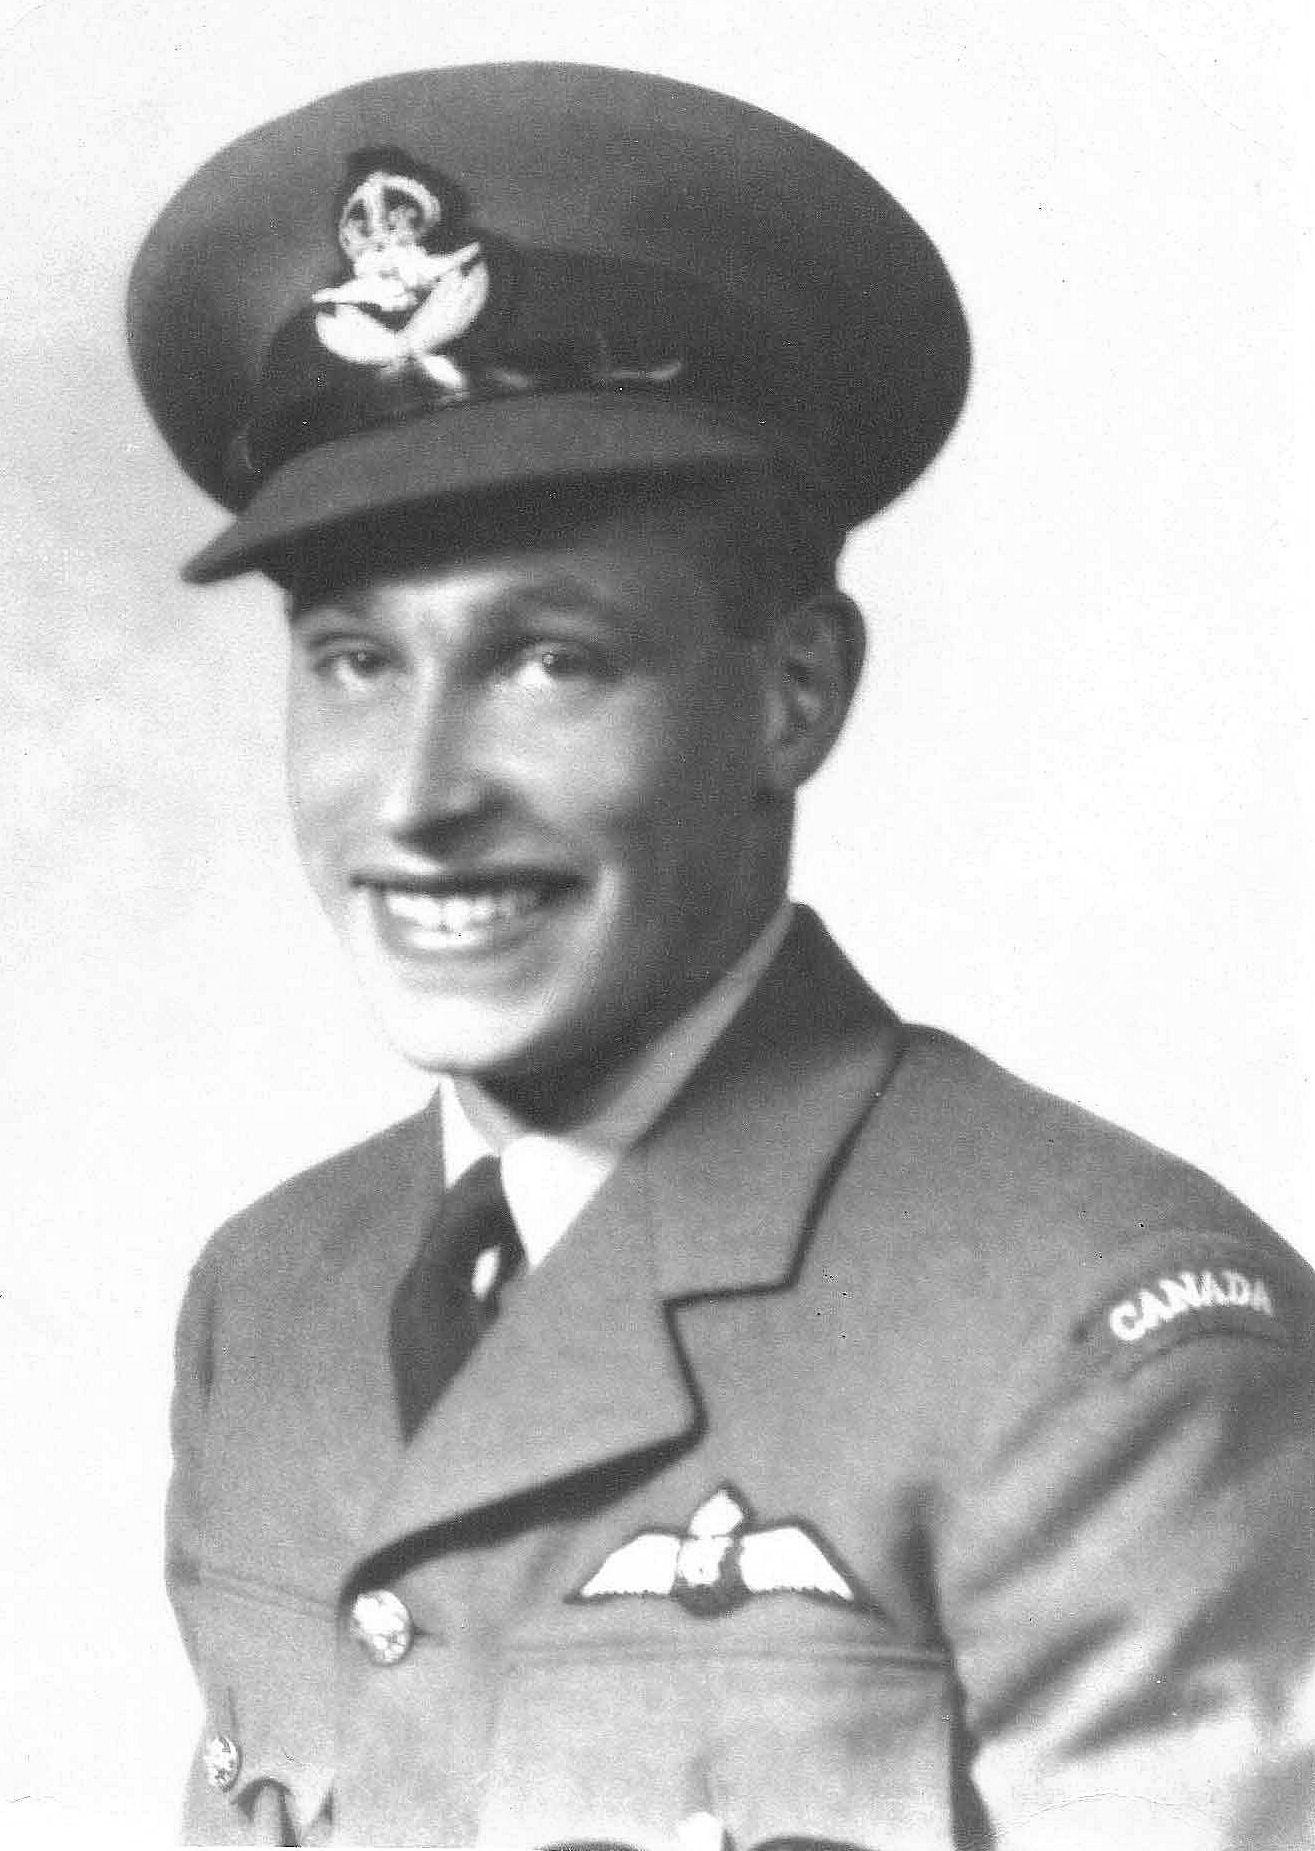 Photo of Frederick (Peter) Wilsher